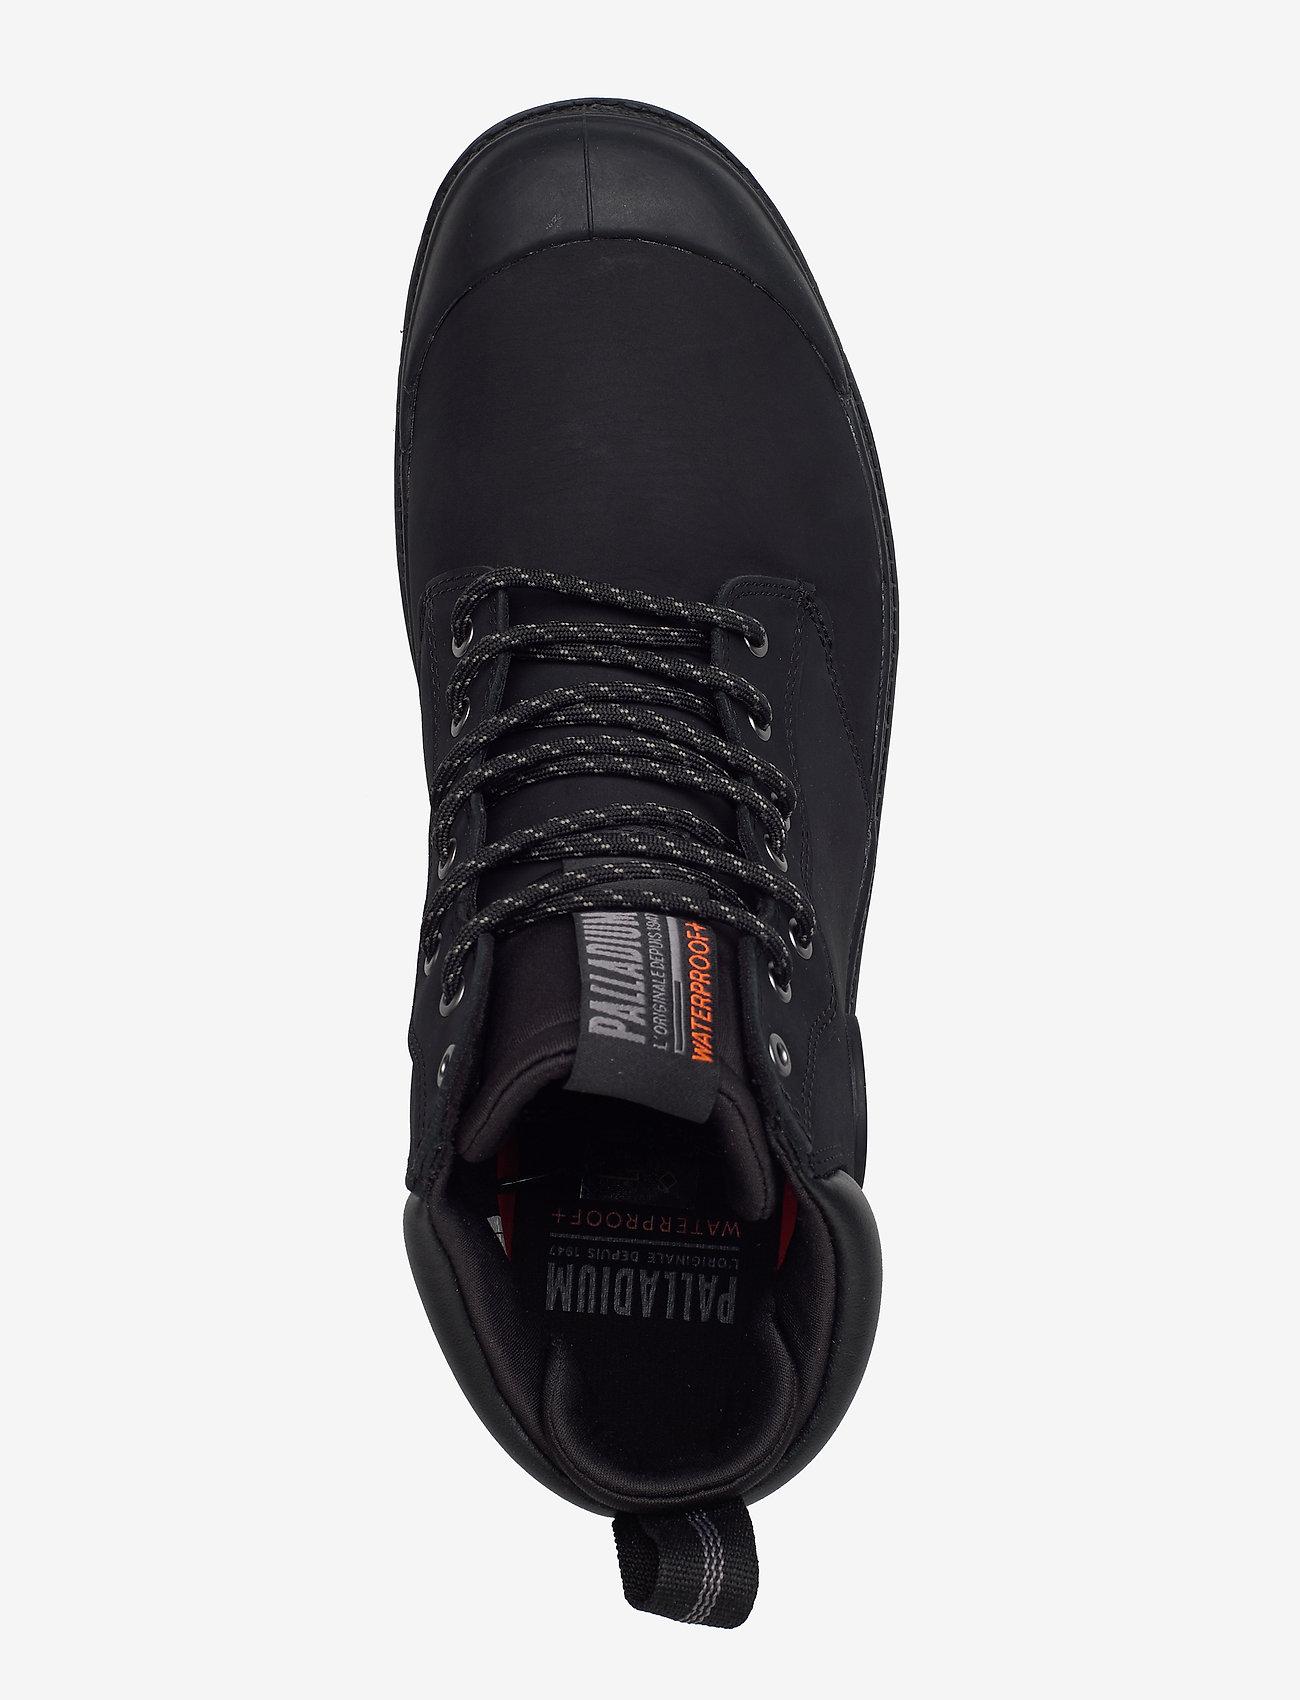 Sportcuff Outside Ii Wp+ L (Black) (154.95 €) - Palladium TmV4x